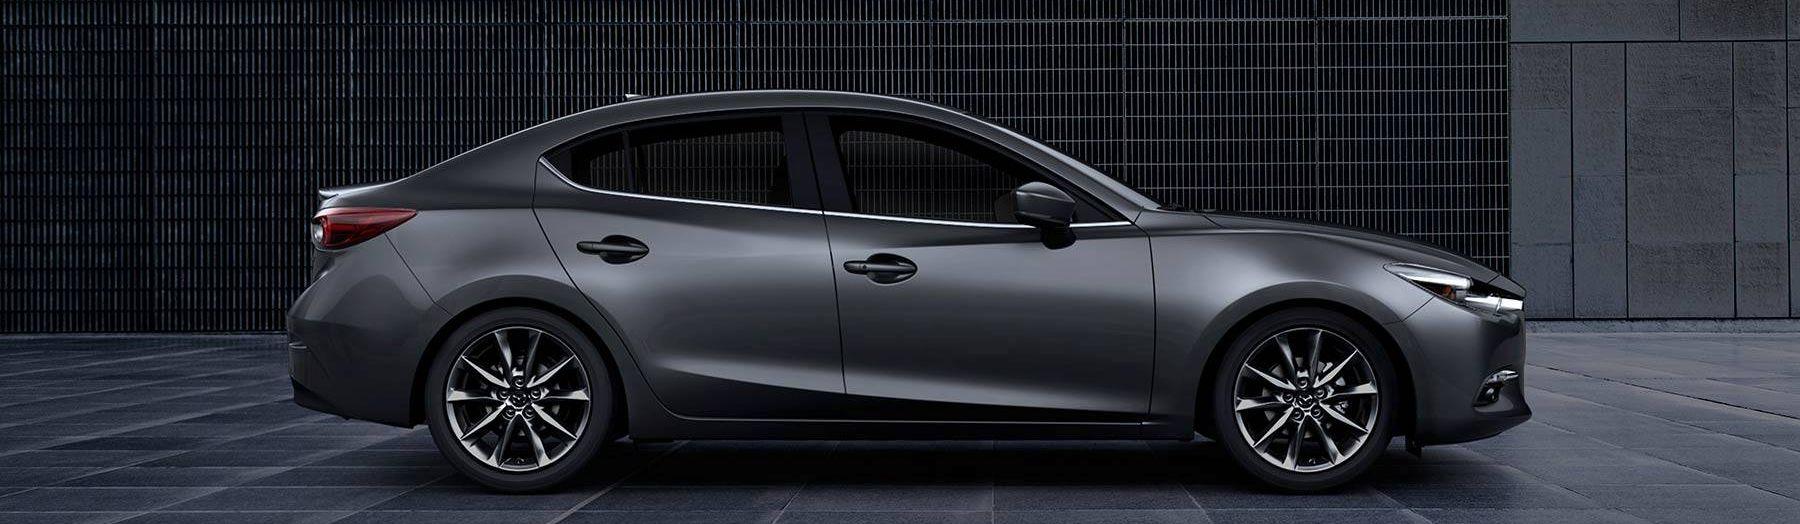 2018 Mazda3 for Sale near Silver Spring, MD